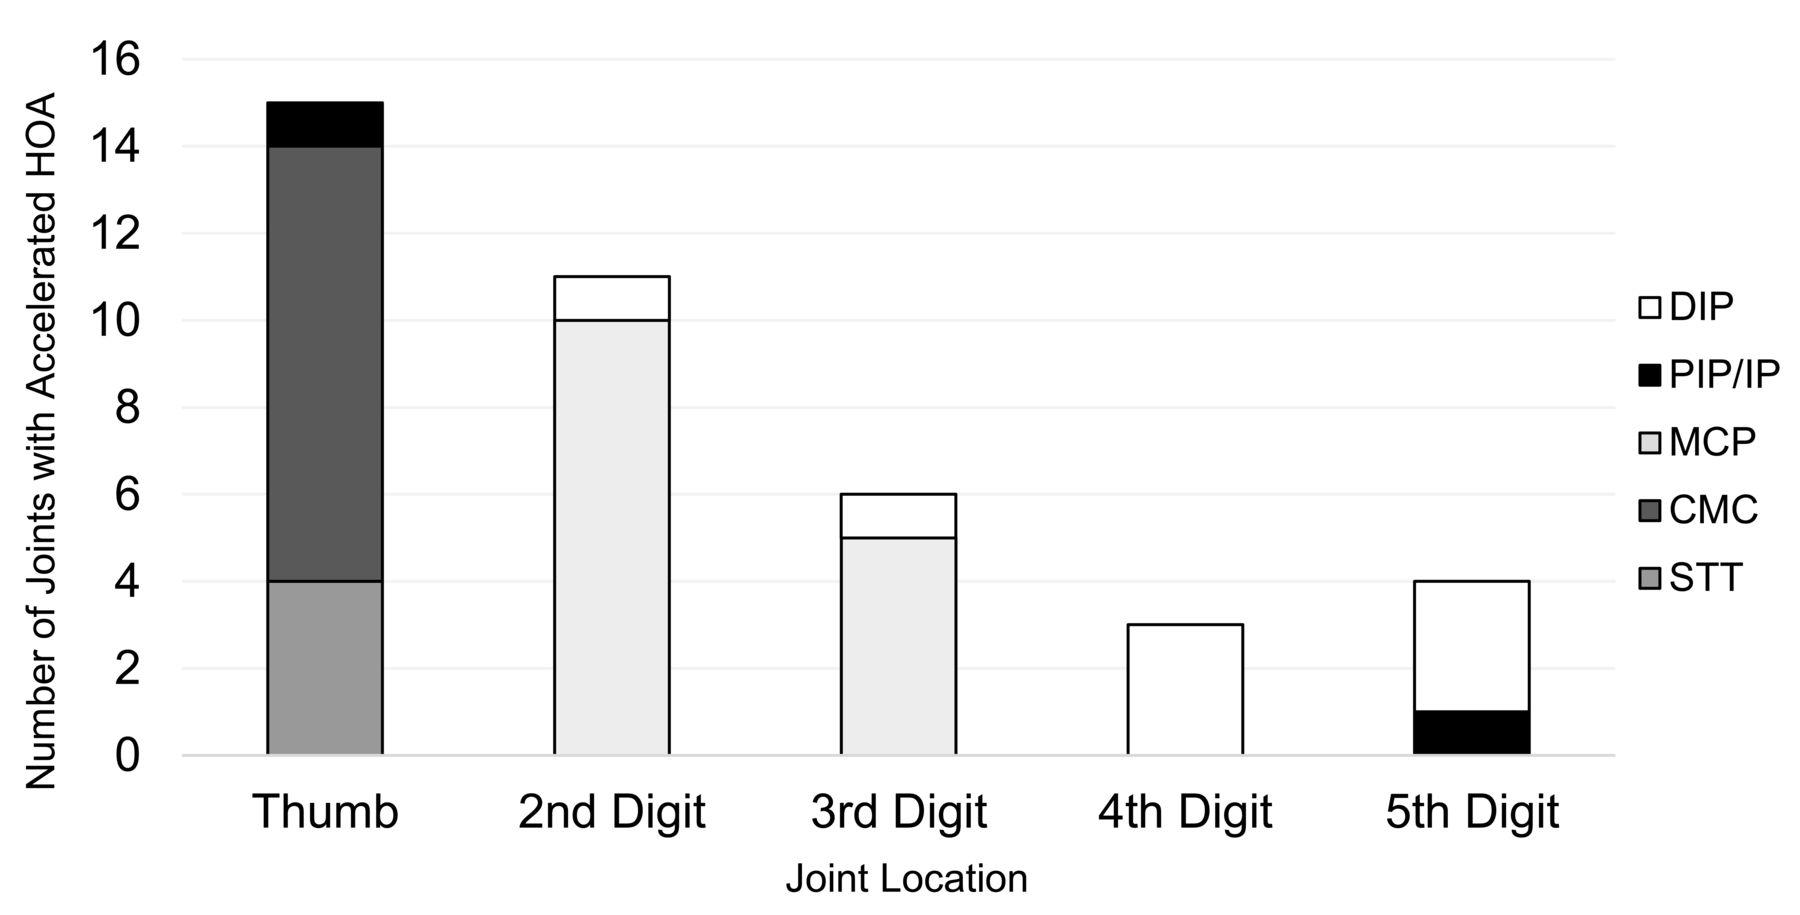 Characteristics of Accelerated Hand Osteoarthritis: Data